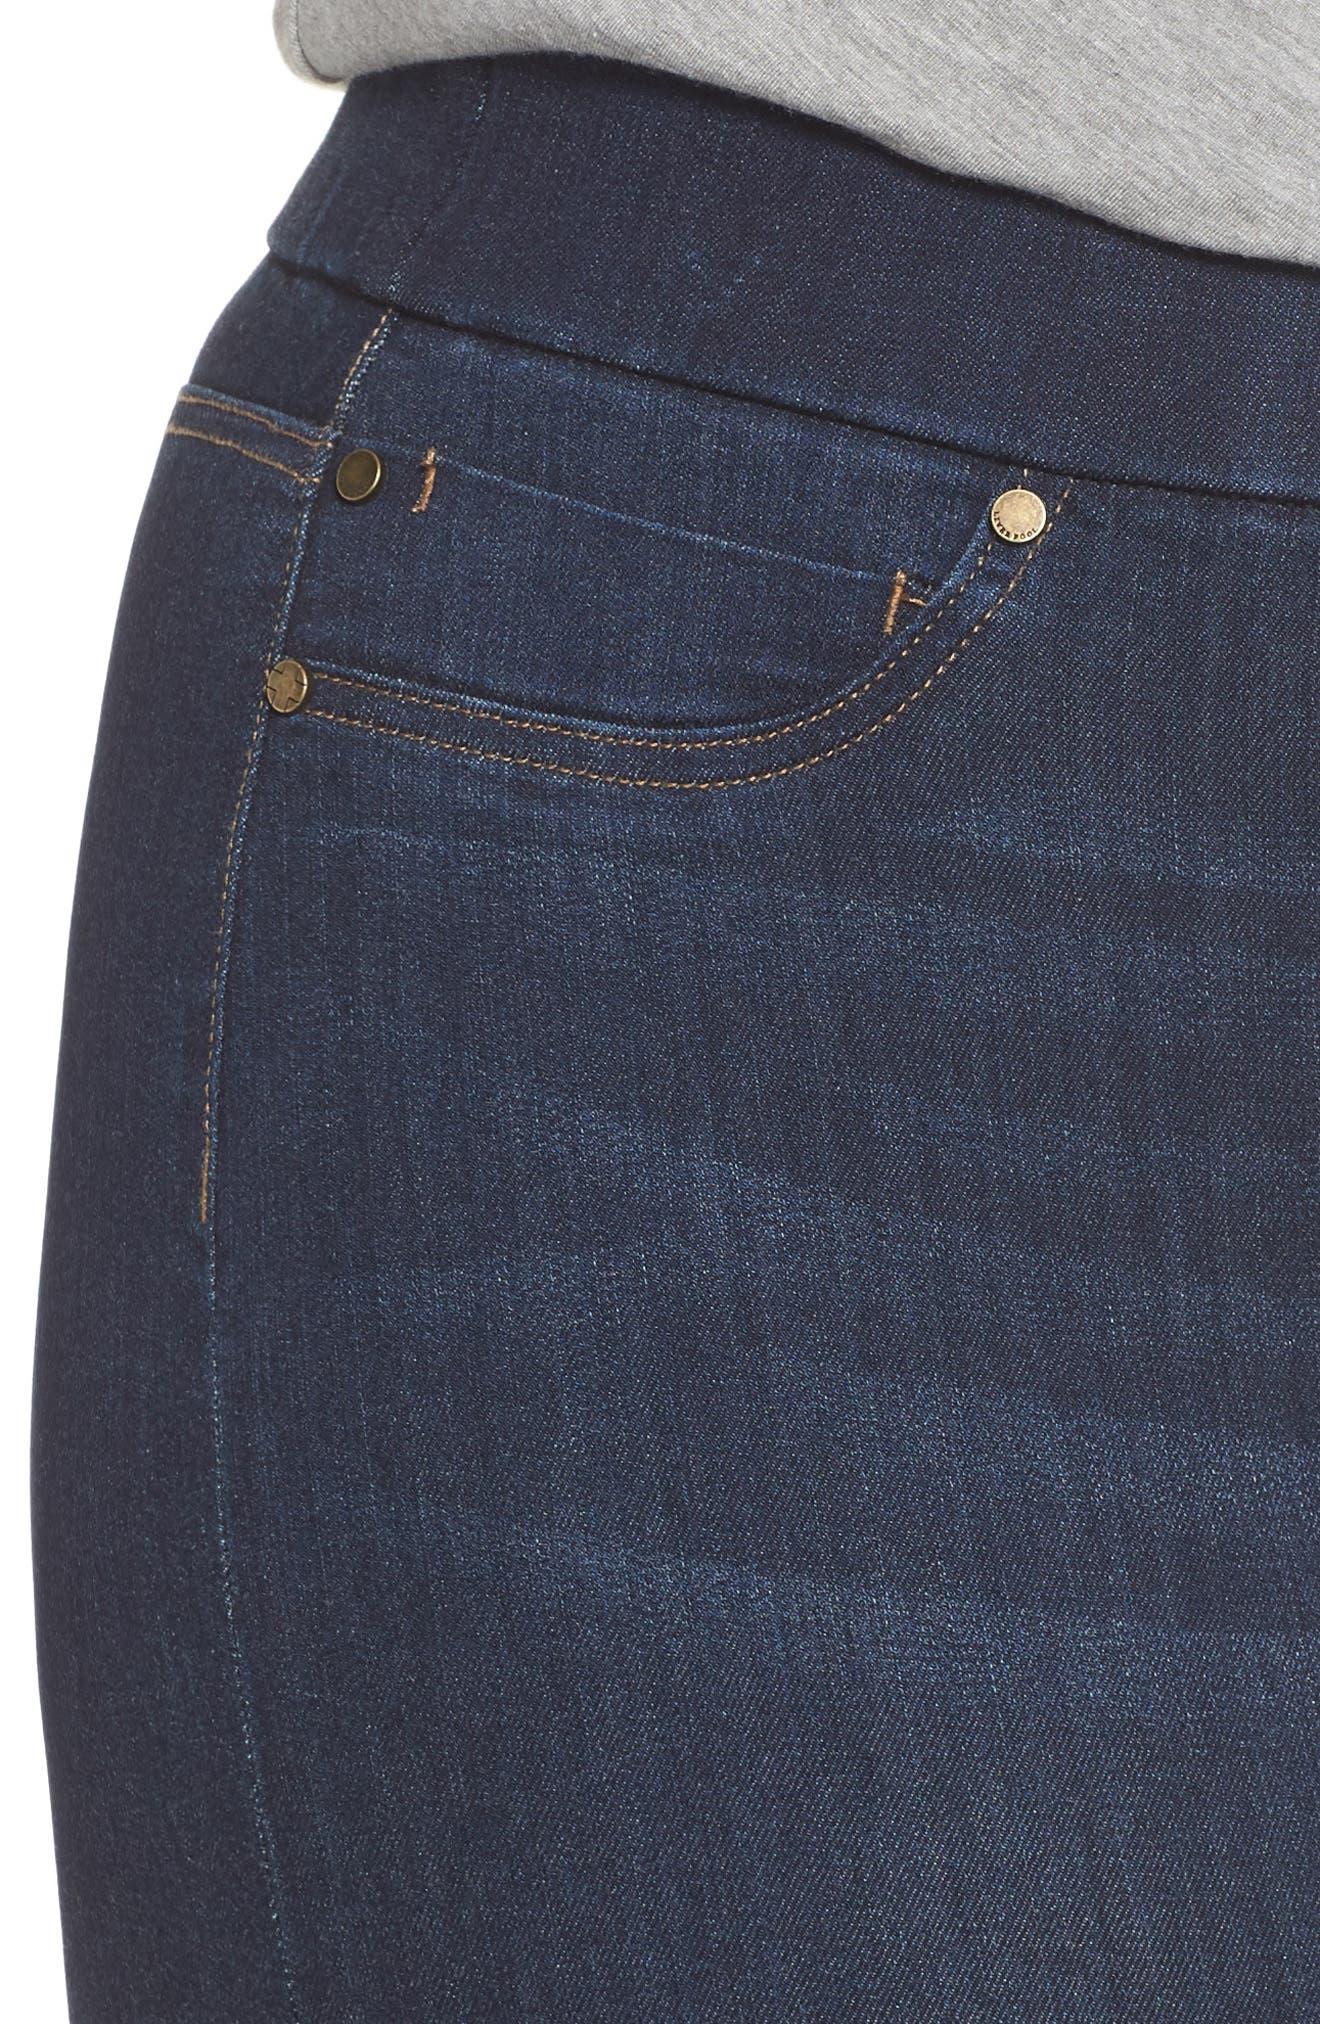 Sienna Pull-On Denim Capri Pants,                             Alternate thumbnail 4, color,                             GRIFFITH SUPER DARK